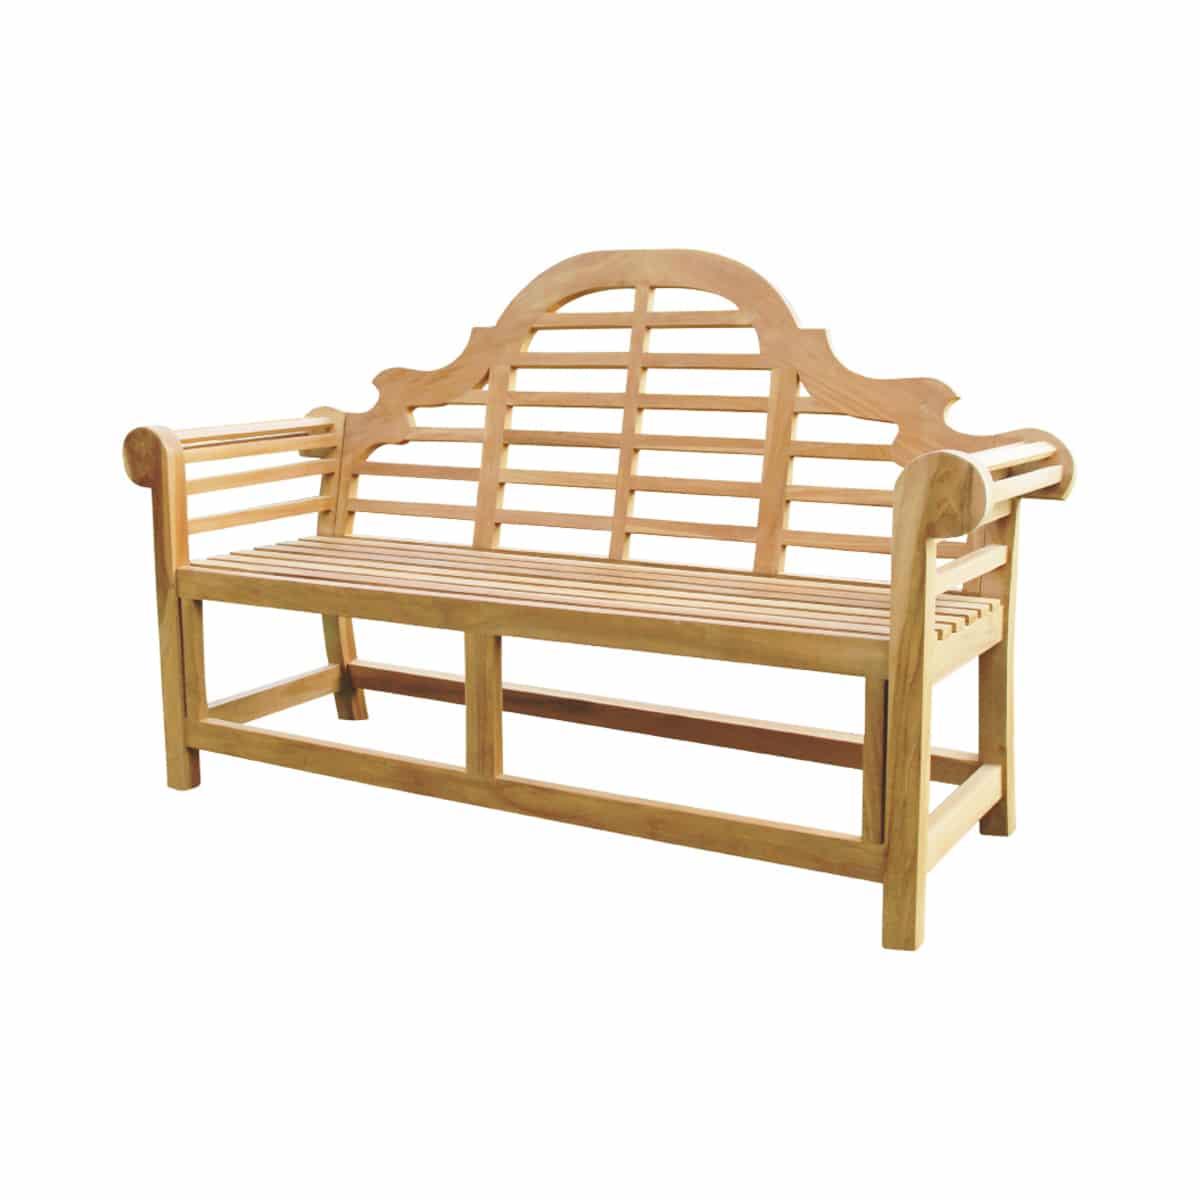 Miraculous Teak Garden Bench Gbc02 Indonesia Outdoor Furniture Machost Co Dining Chair Design Ideas Machostcouk